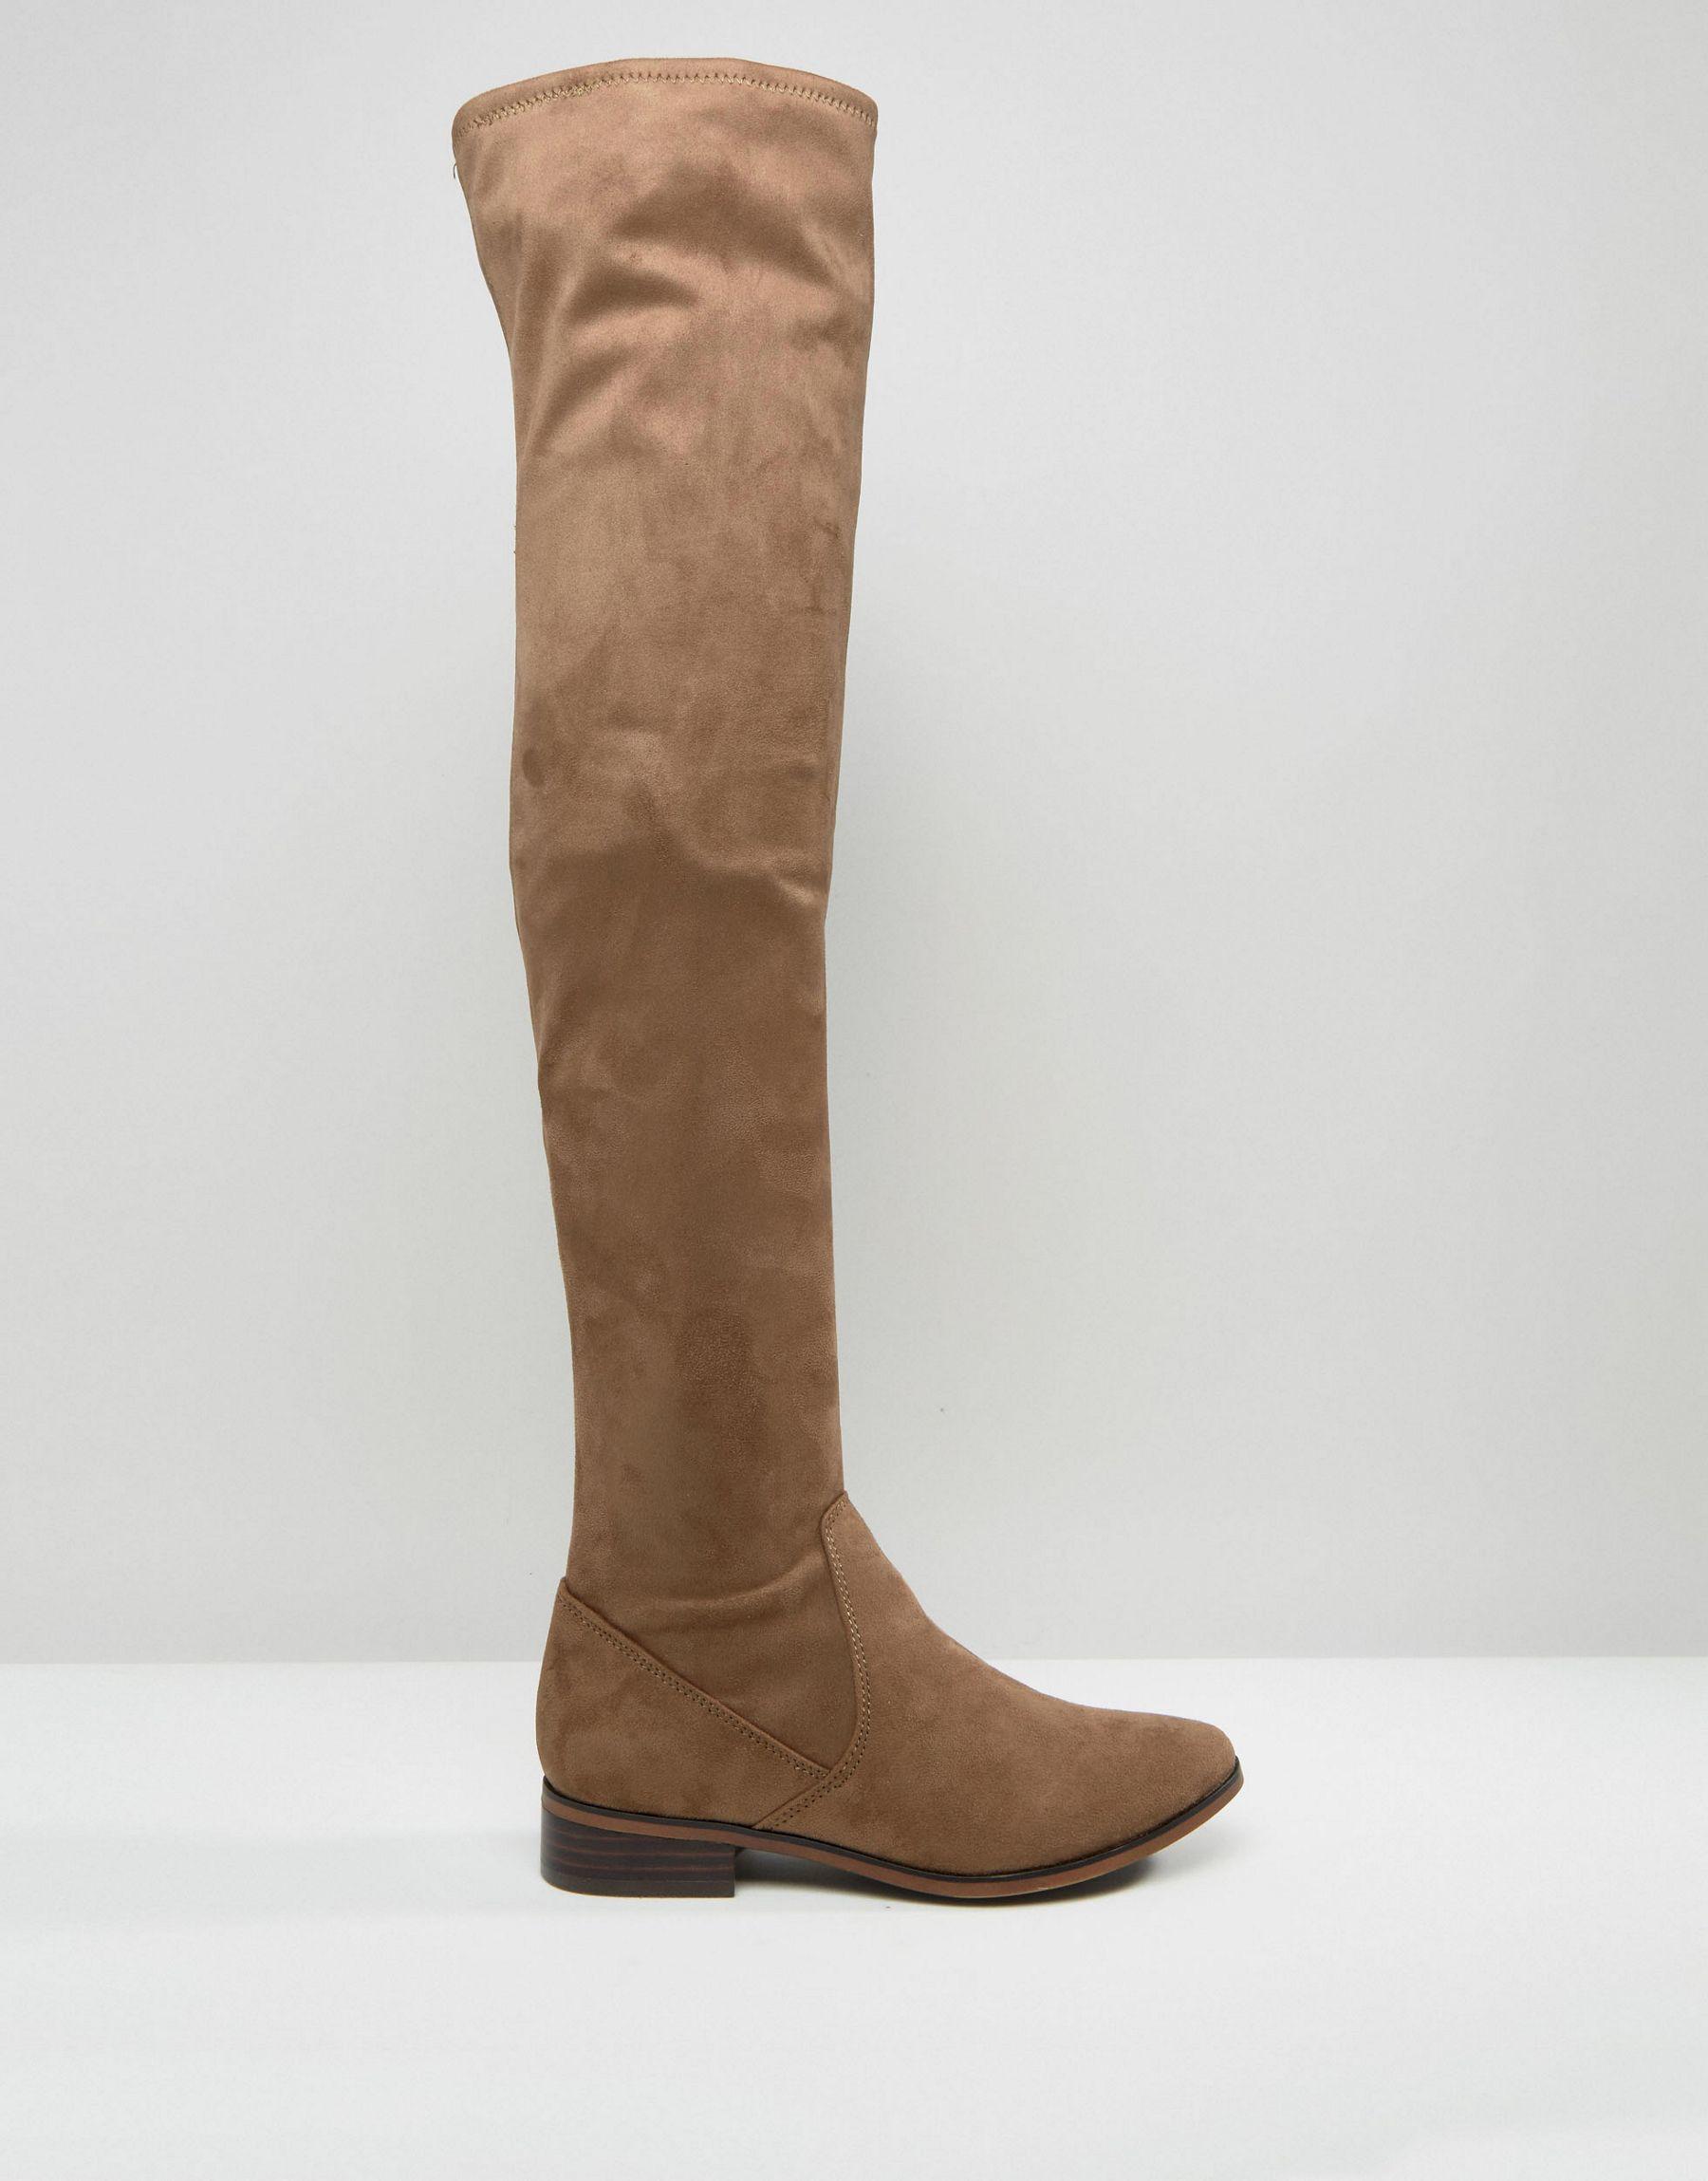 638f5b6762b Lyst - ALDO Ldo Elinna Flat Over The Knee Boots in Brown